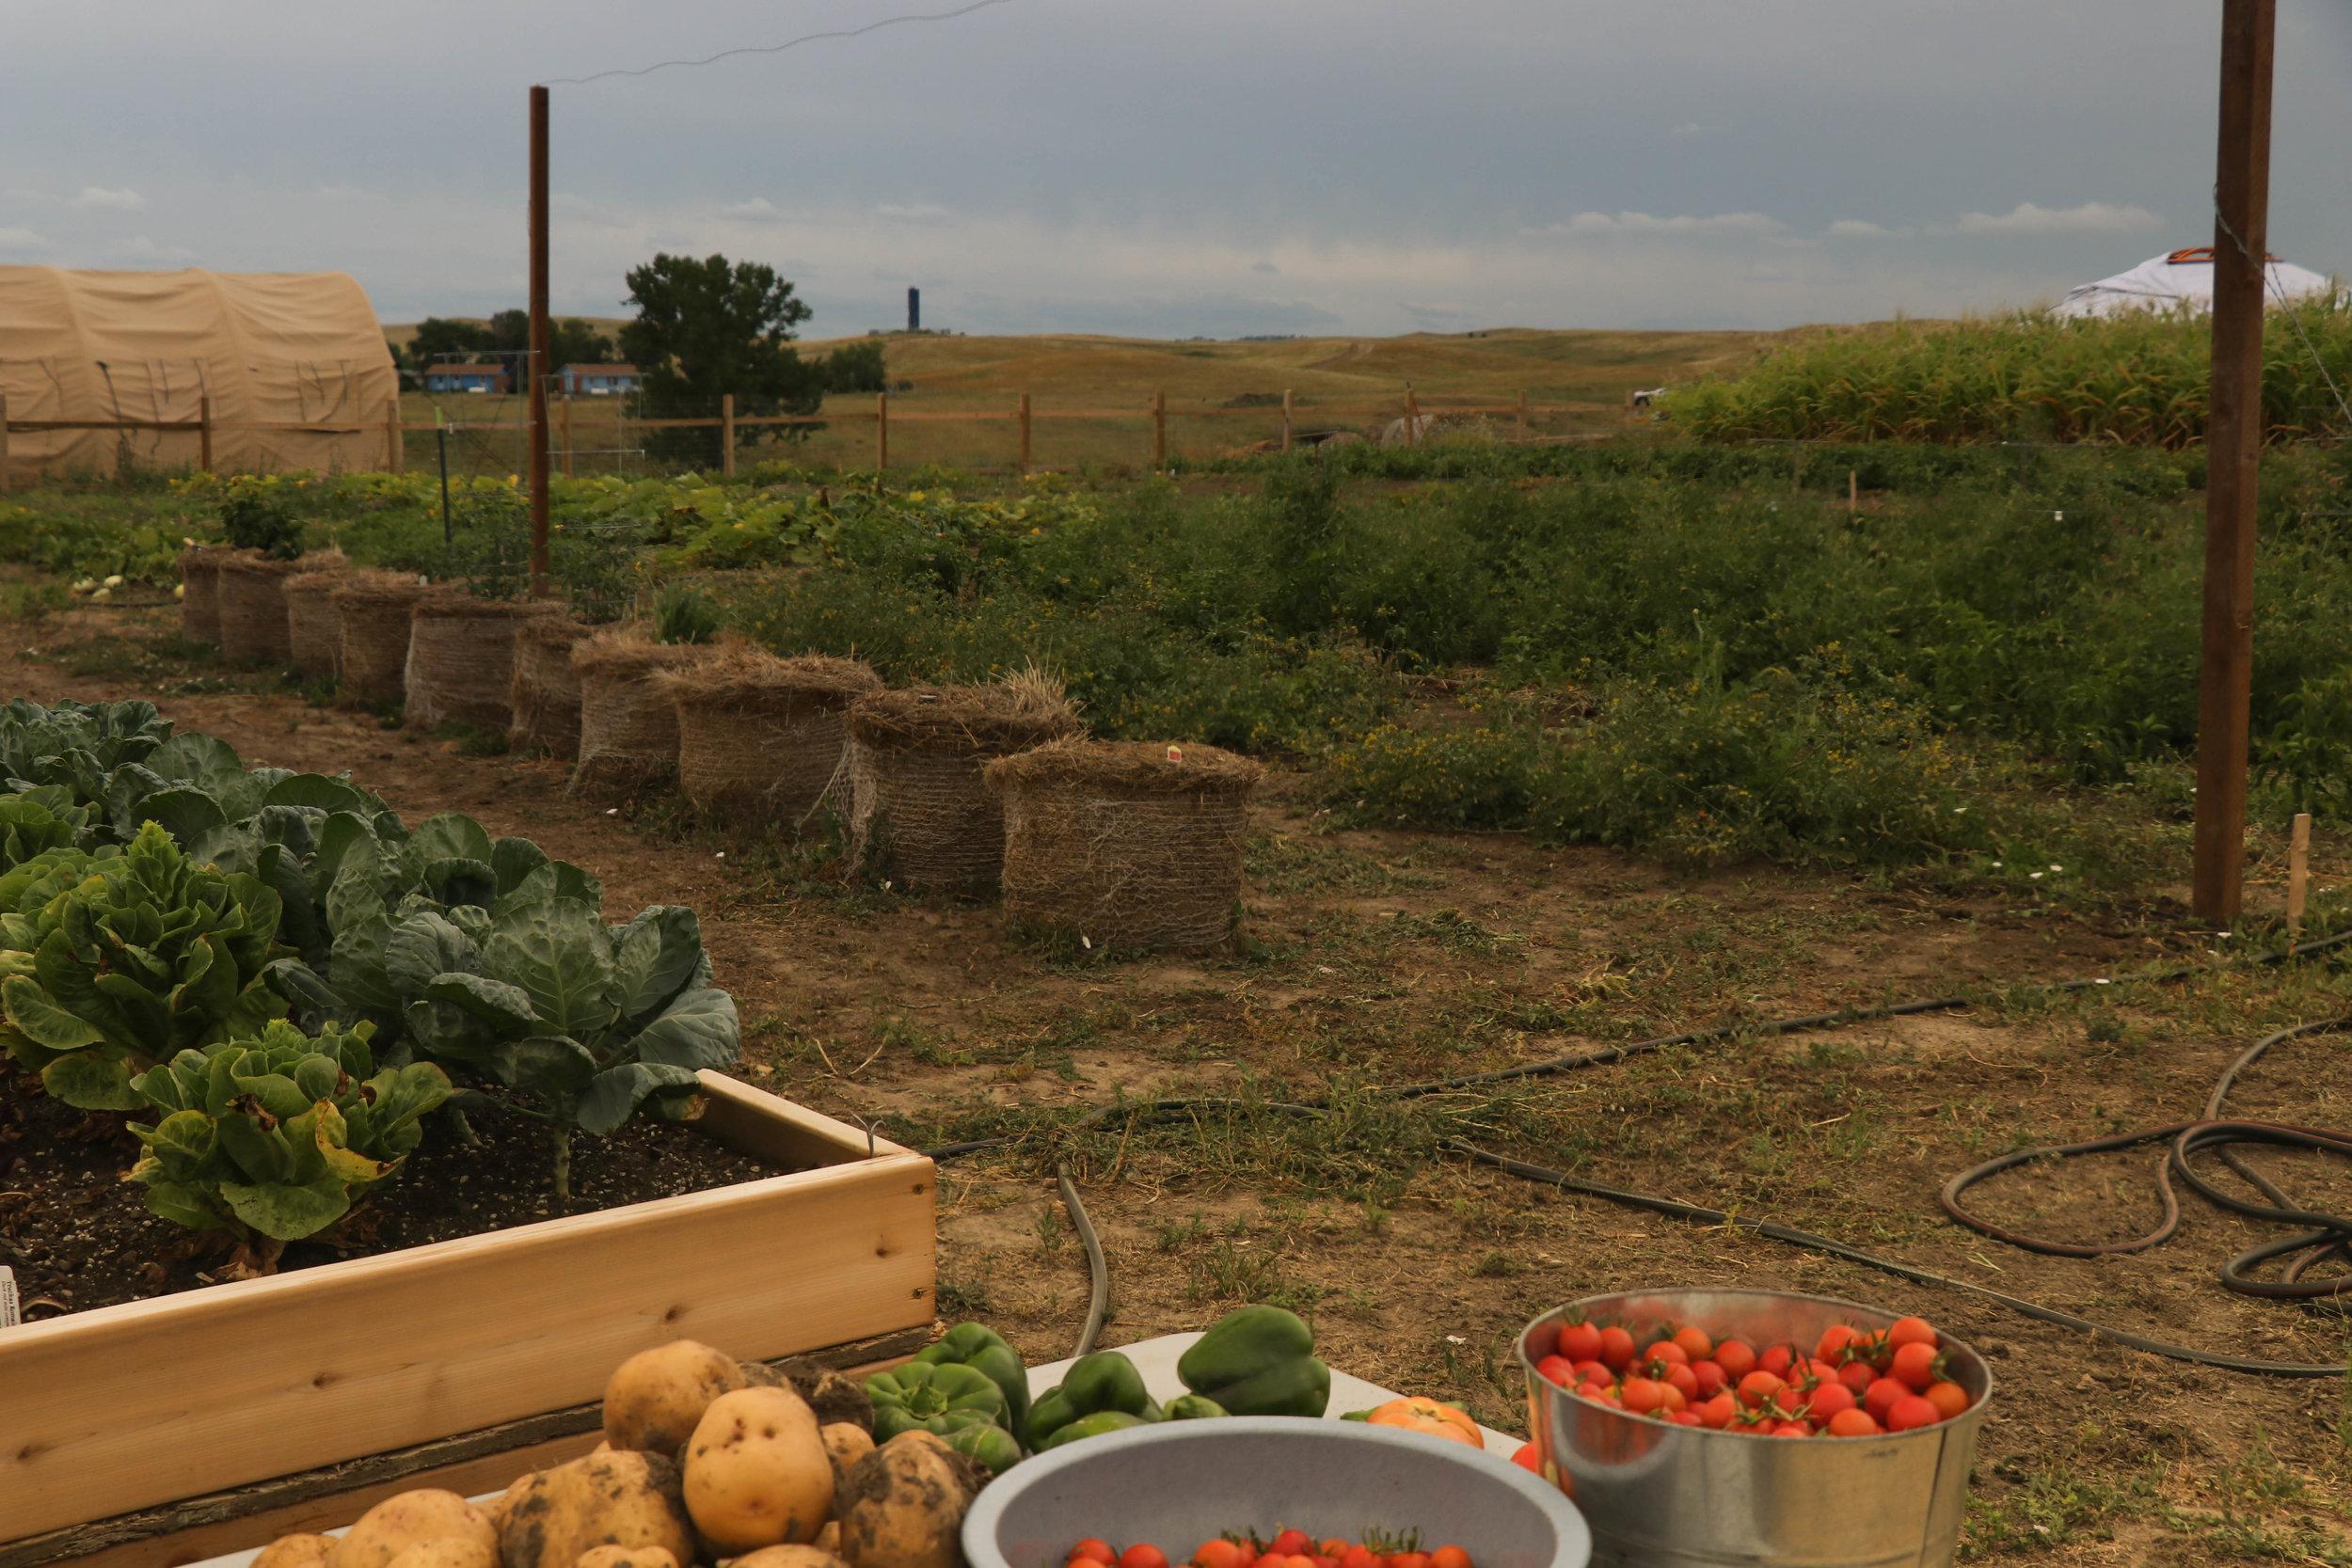 Kale, cabbage, potatoes, tomatoes. - MK